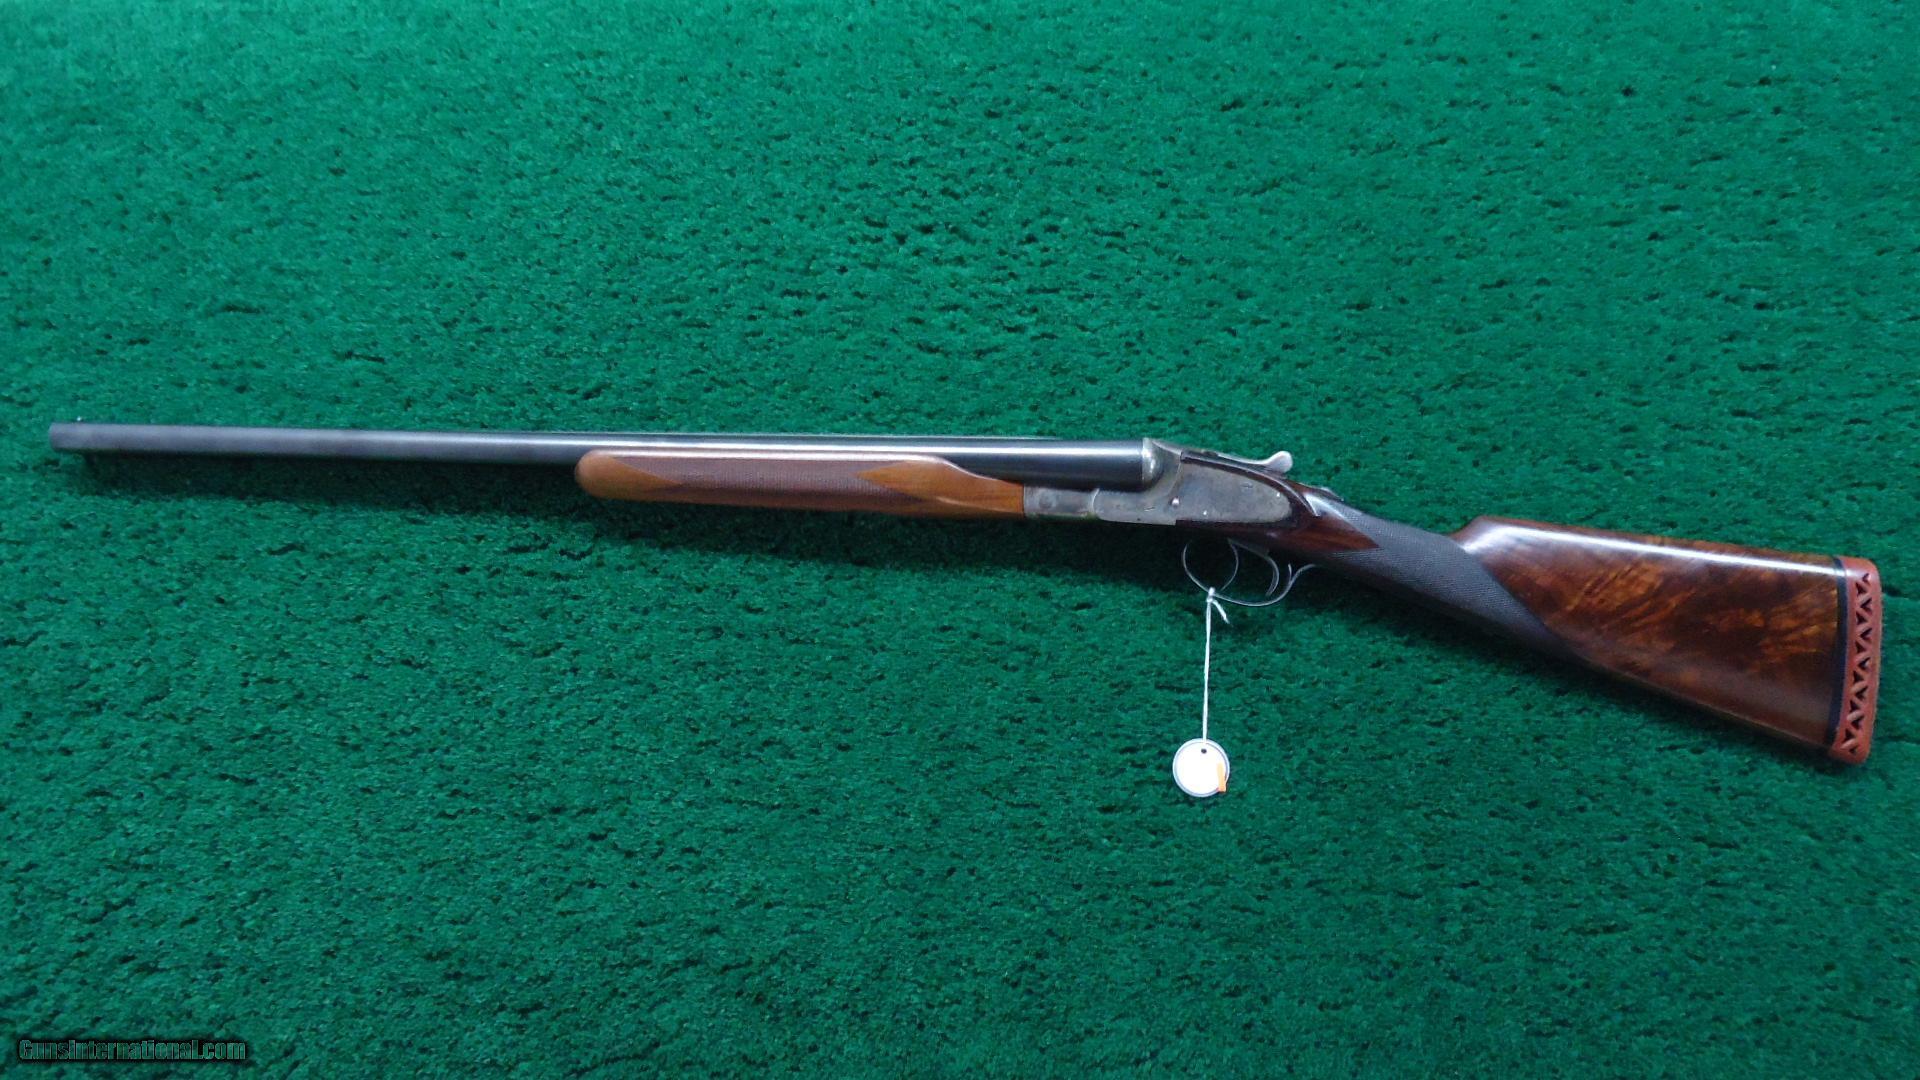 L.C. SMITH DOUBLE BARREL 12 GAUGE SHOTGUN